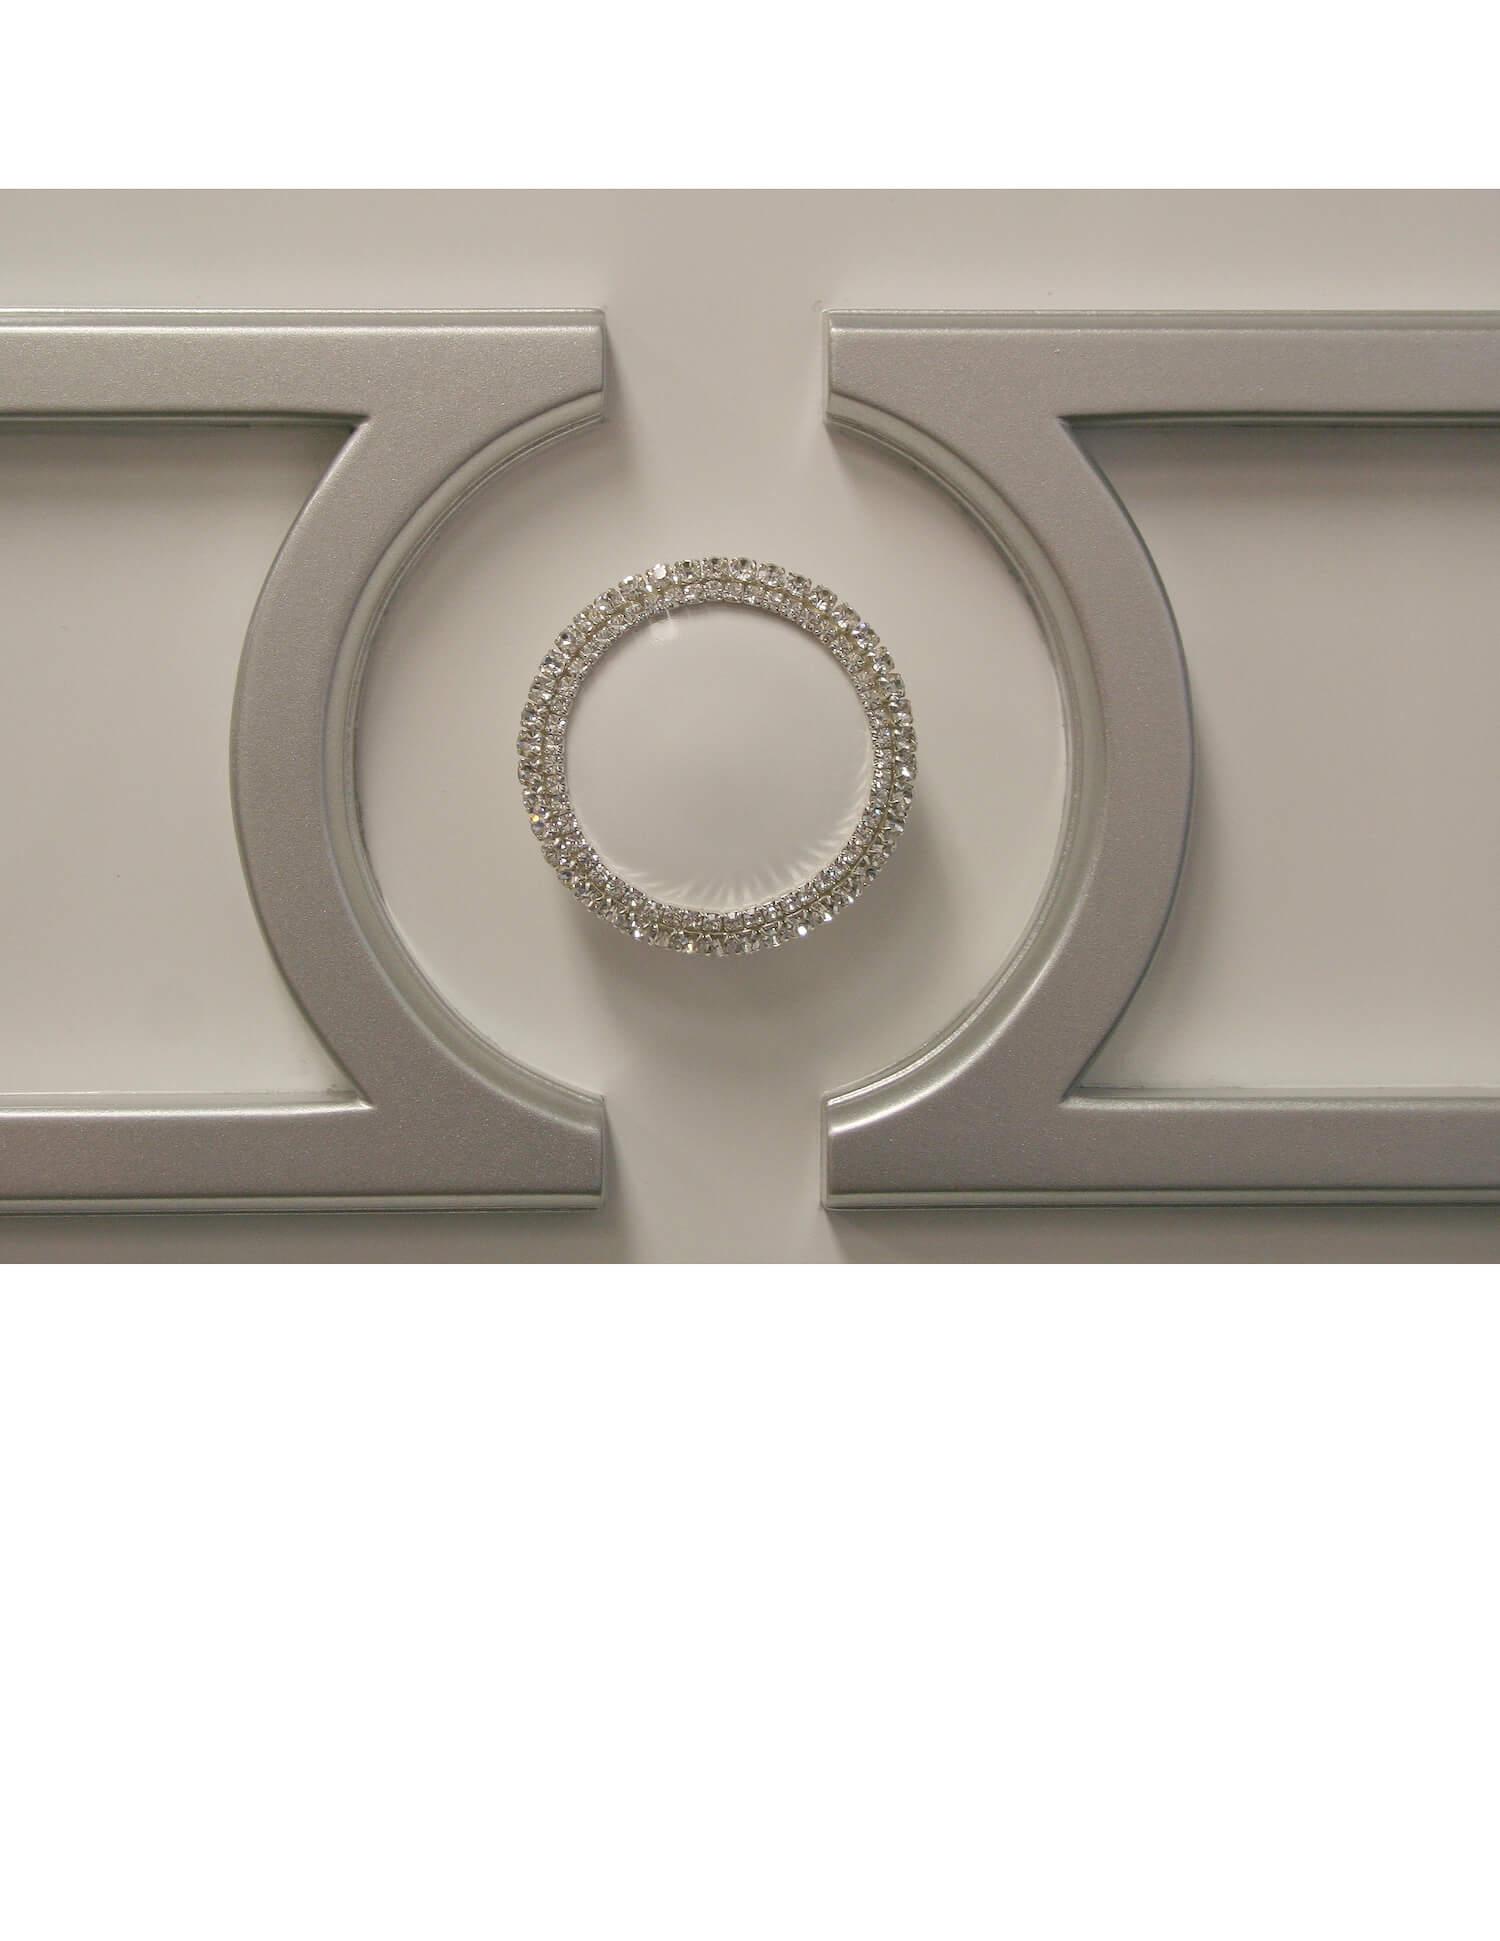 Art Deco Furniture Or Cabinet Knob